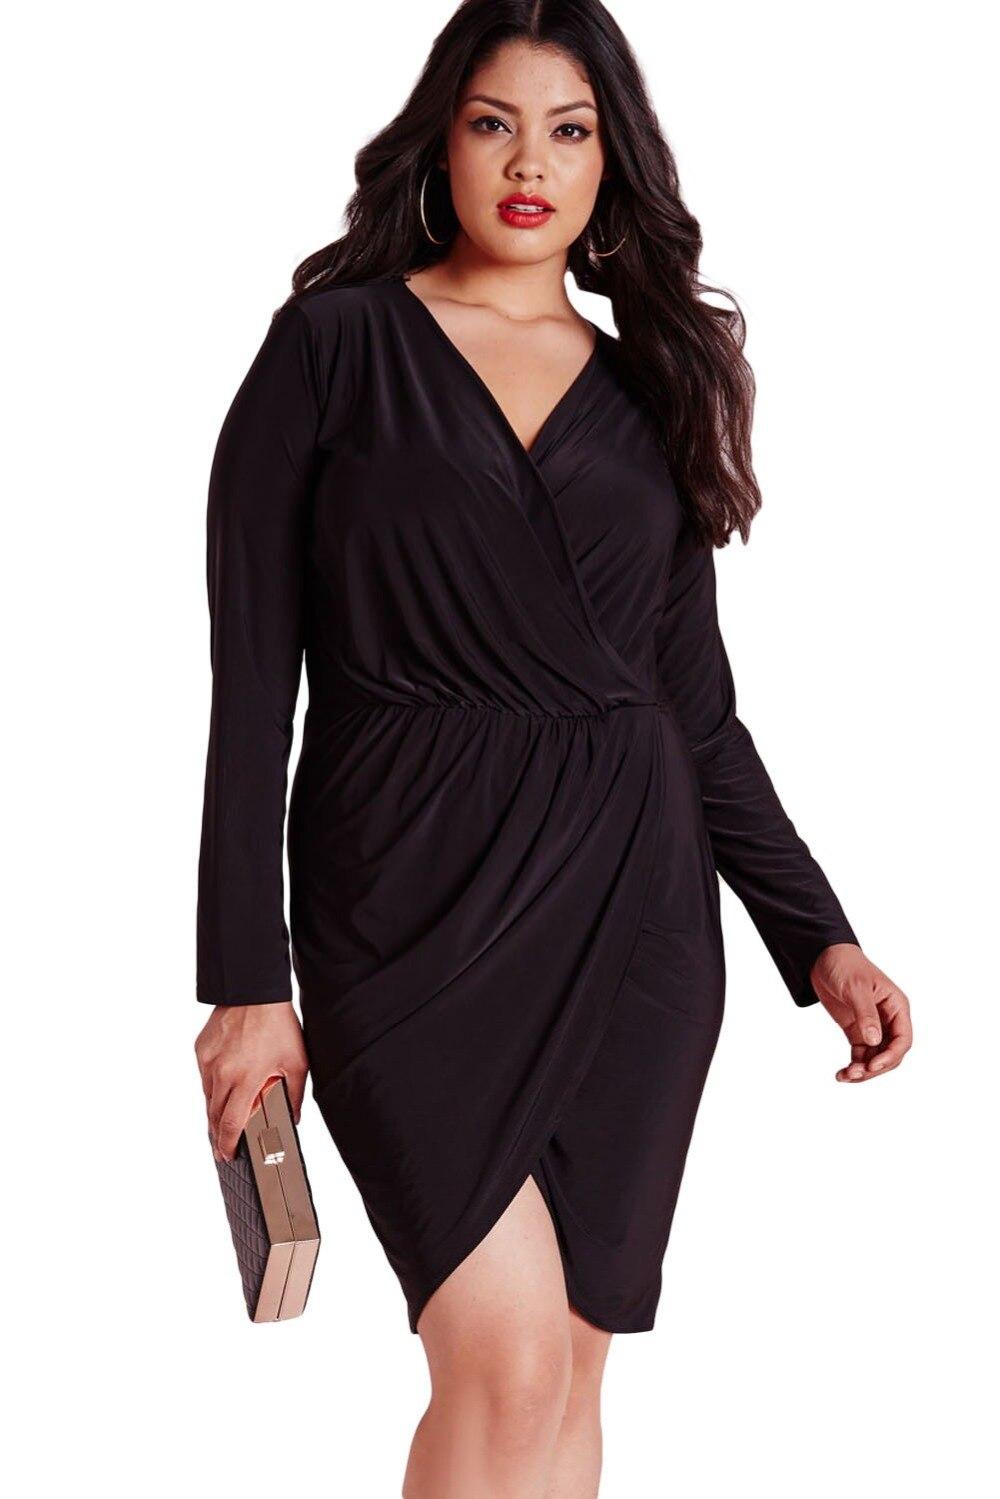 Dear Lover Winter Black Plus Size V Neck Slinky Wrap Dress Vestidos Big Size  XXXL Long Sleeve Office Autumn Large Woman LC60862-in Dresses from Women s  ... 9b747b60562d